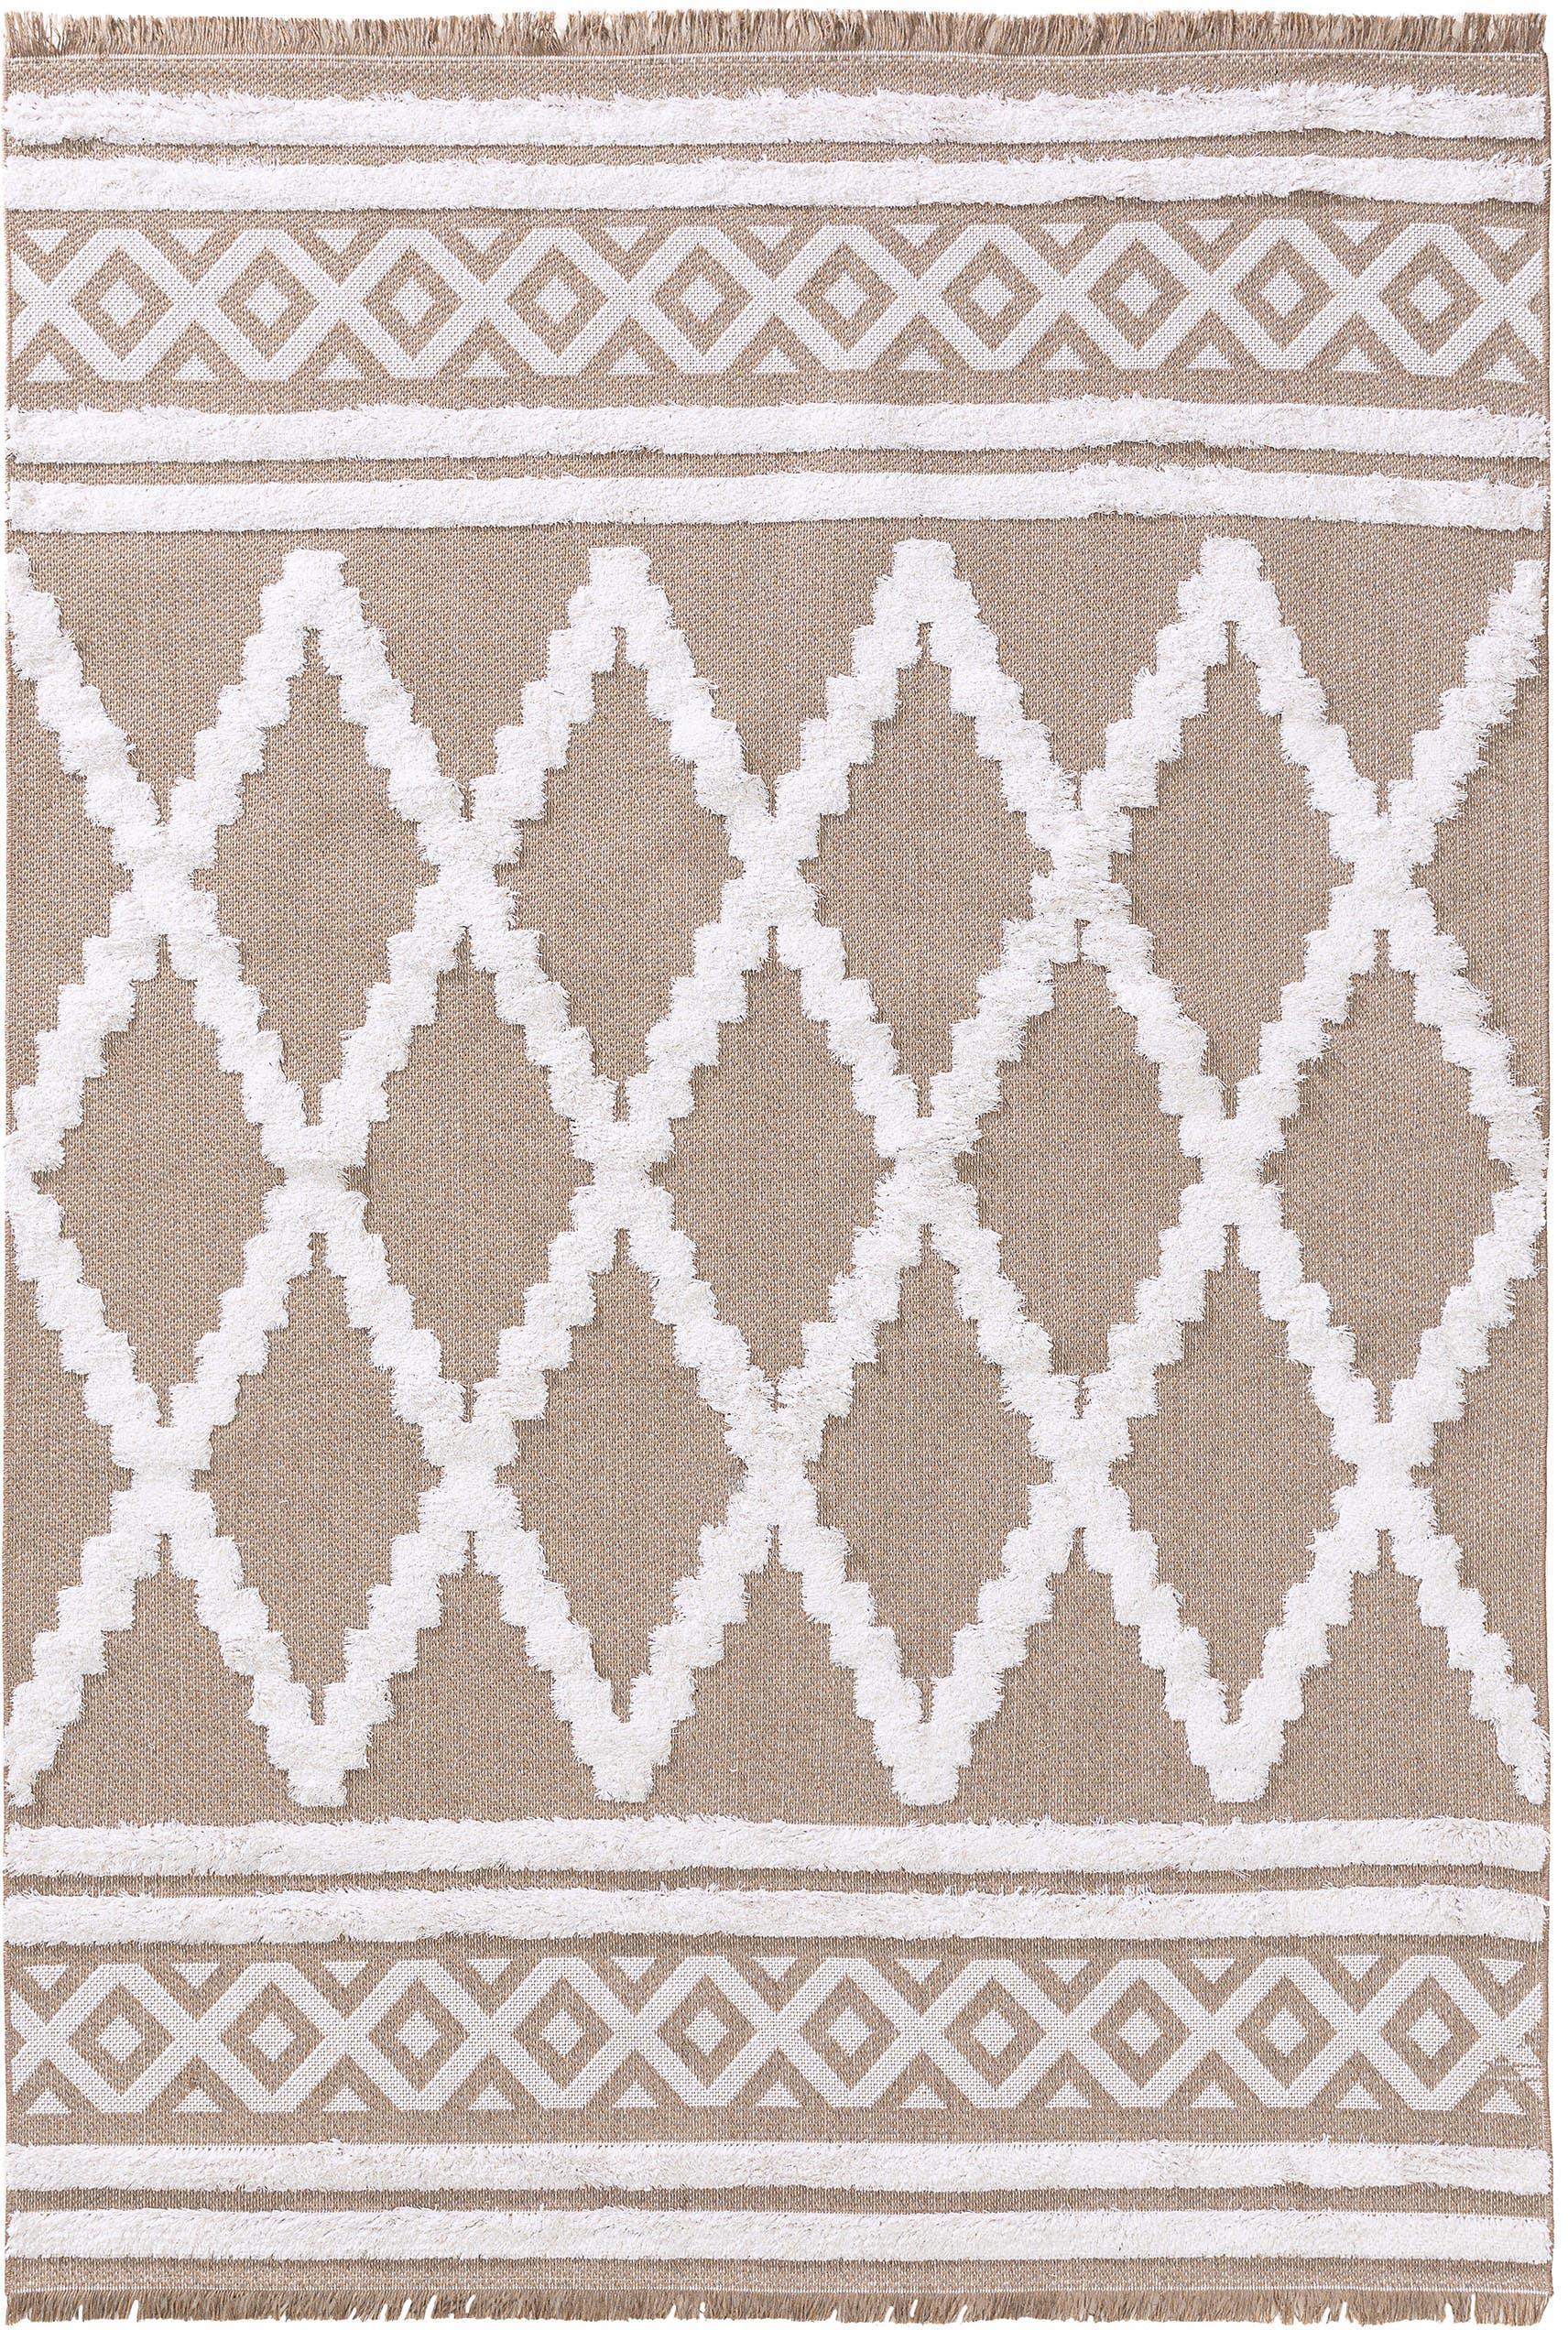 Wasbare katoenen vloerkleed Oslo Karo met hoog-laag-structuurpatroon, 100% katoen, Taupe, crèmewit, B 190 x L 280 cm (maat M)